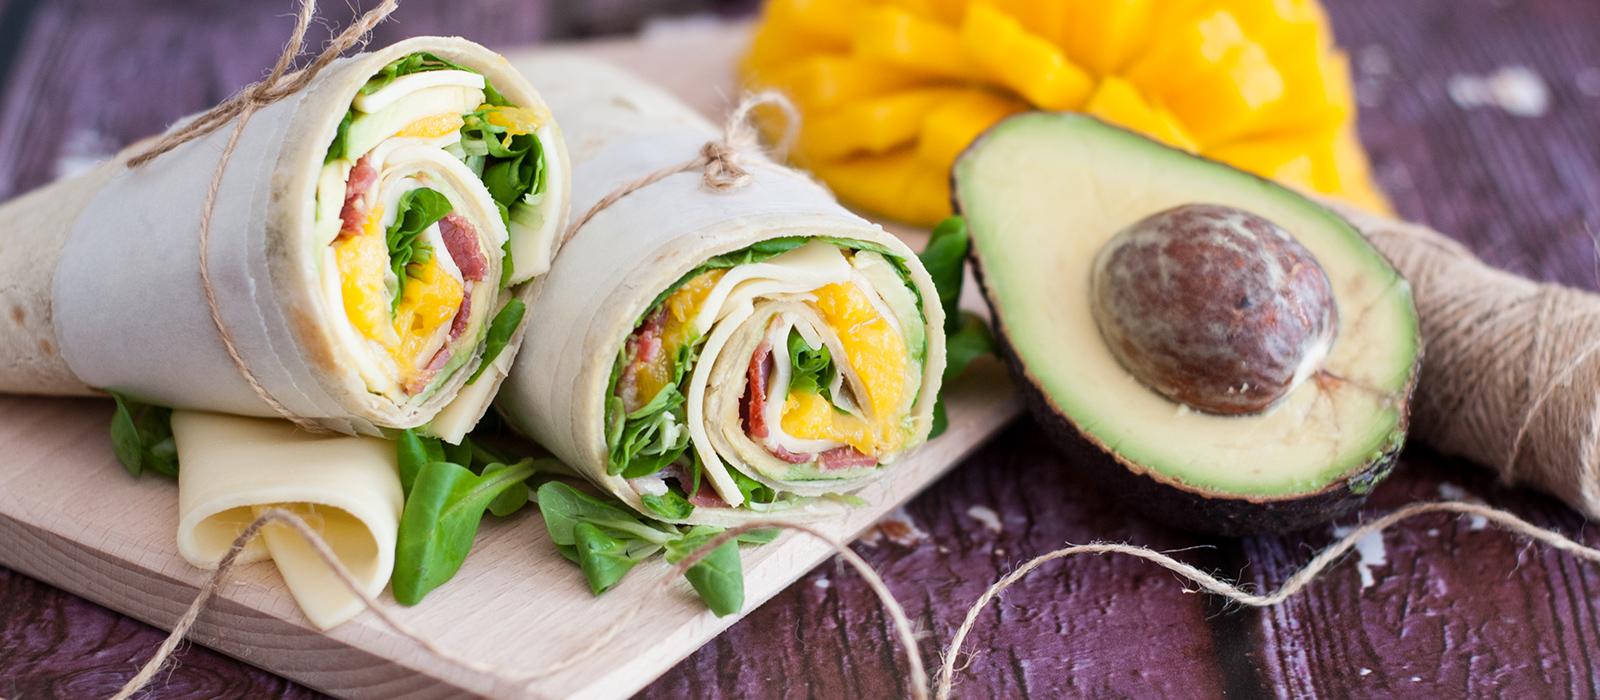 Rezept für Avocado-Wrap mit Käse